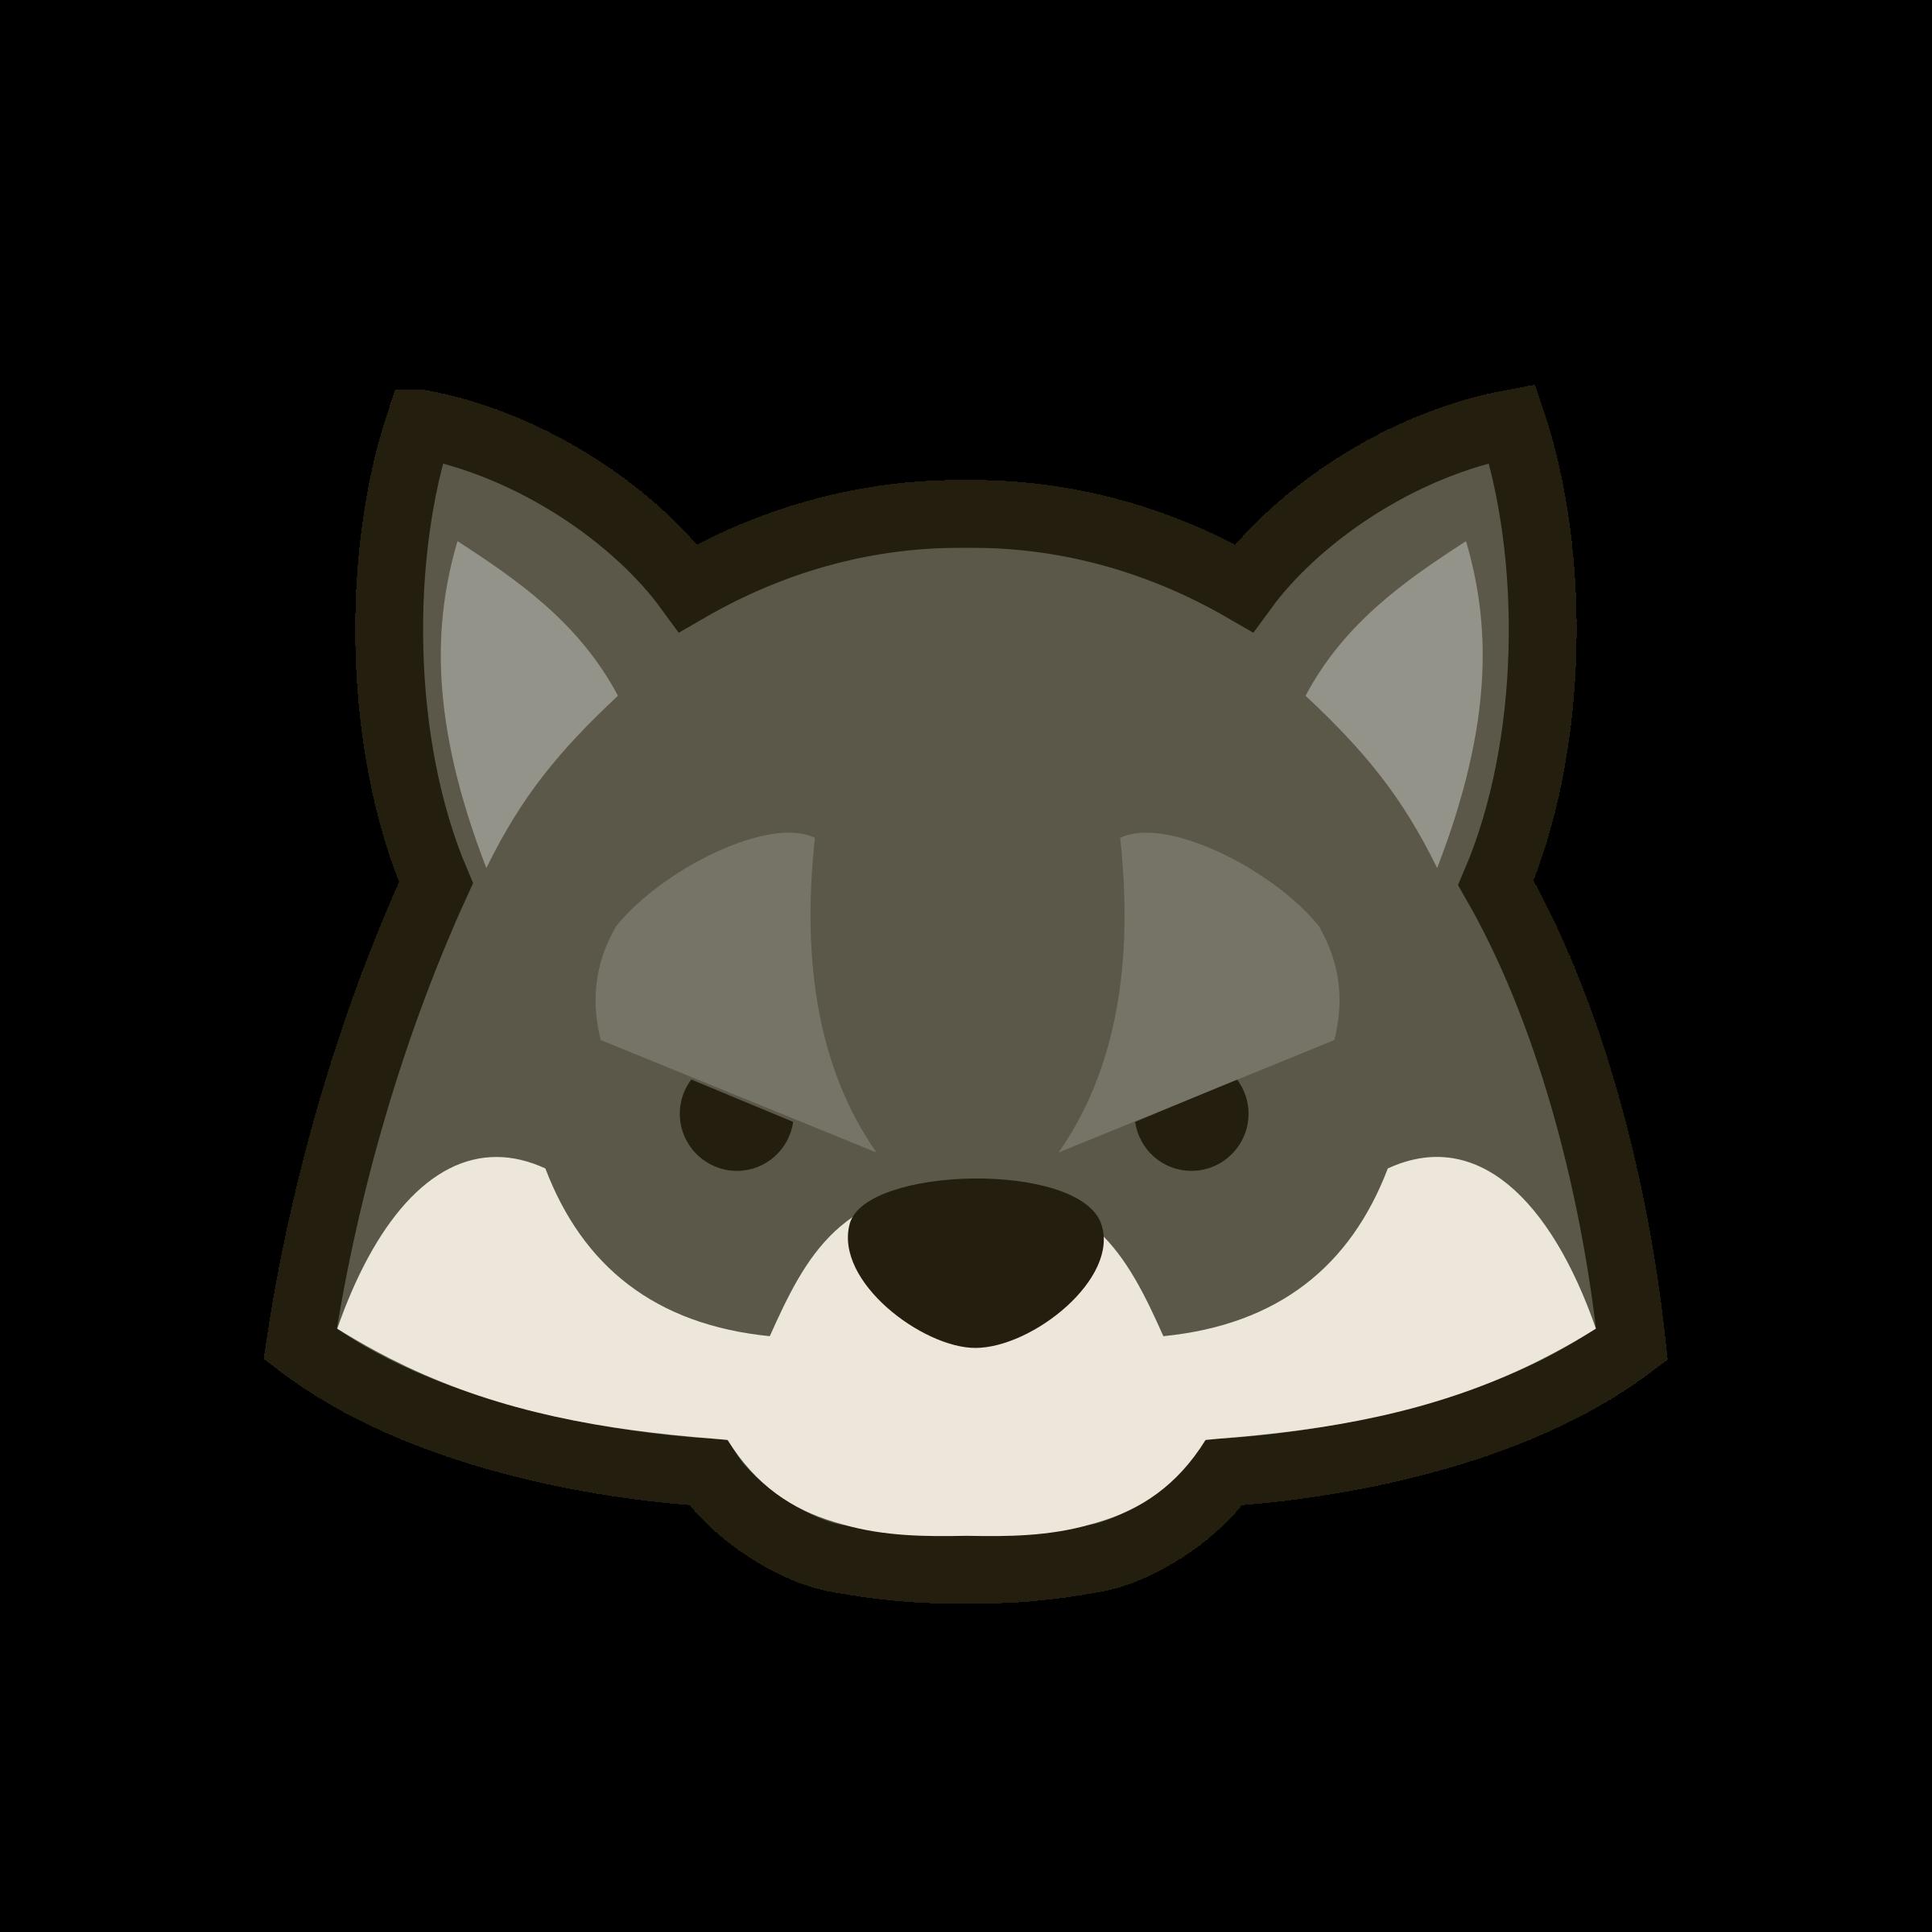 Woodland clipart wolf. Dou shou qi big